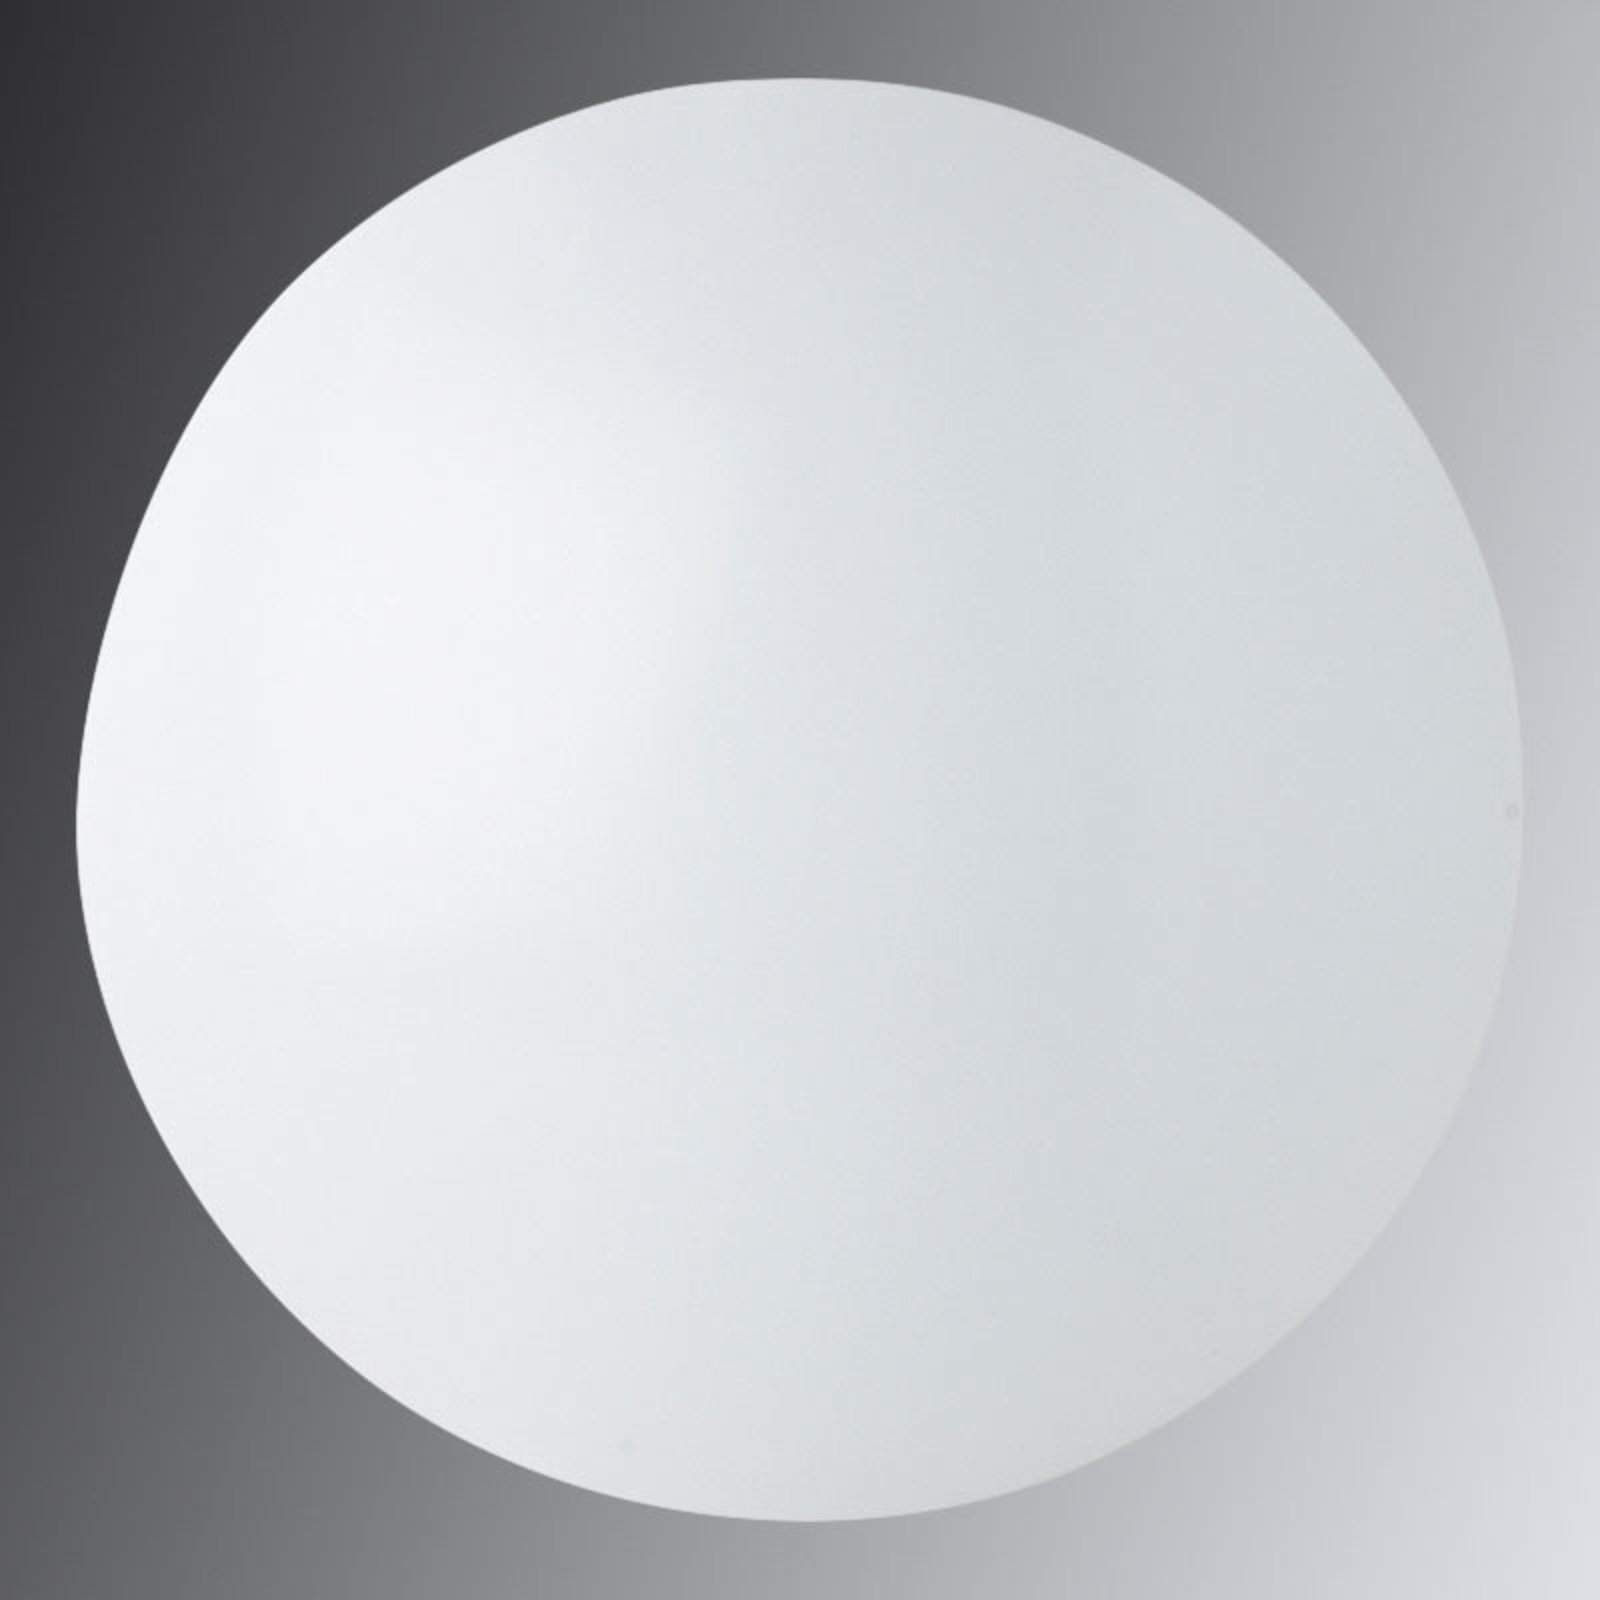 Helle LED plafondlamp Renzo,31,5 W, 3.000 K